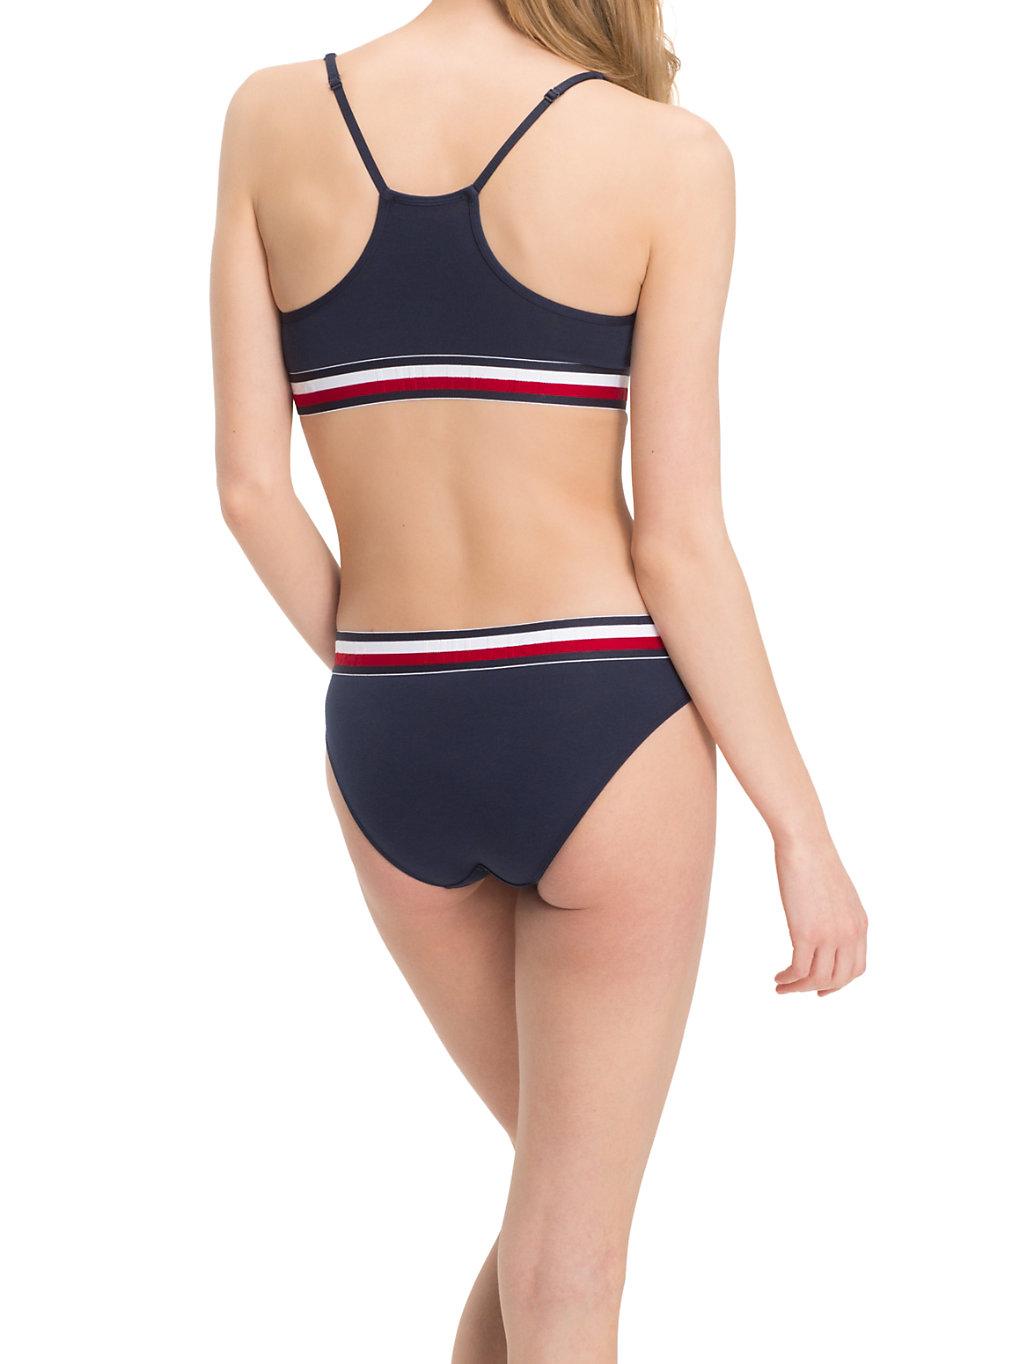 Tommy Hilfiger - Unterhose im Bikini-Look - 2